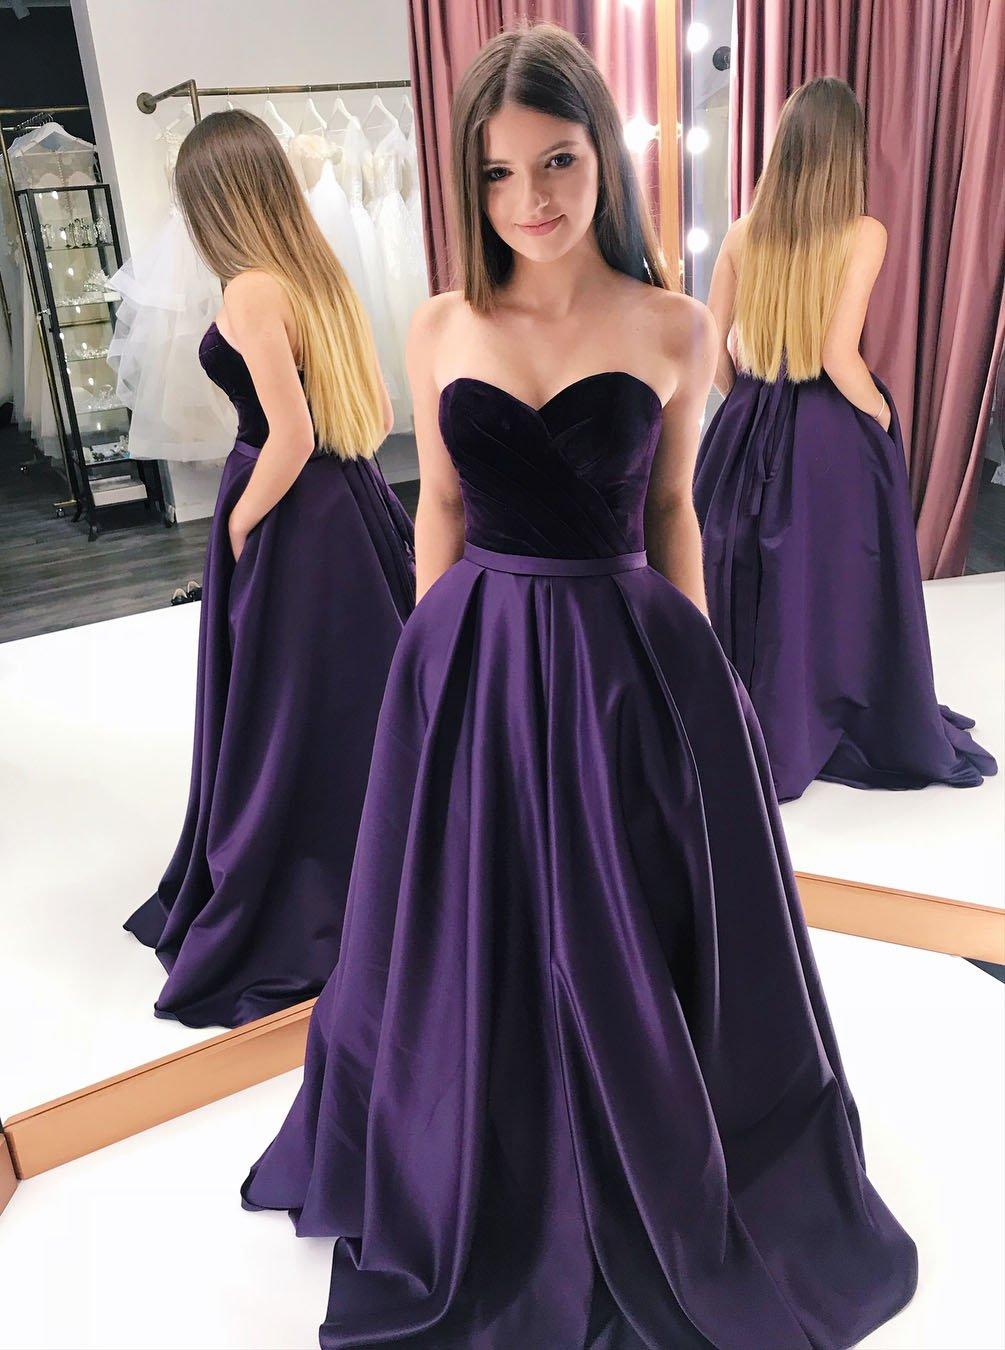 Elegant Purple Satin Sweetheart Long Prom Dresses With Pockets Op452 Sweetheart Prom Dress Satin Prom Dress Purple Prom Dress